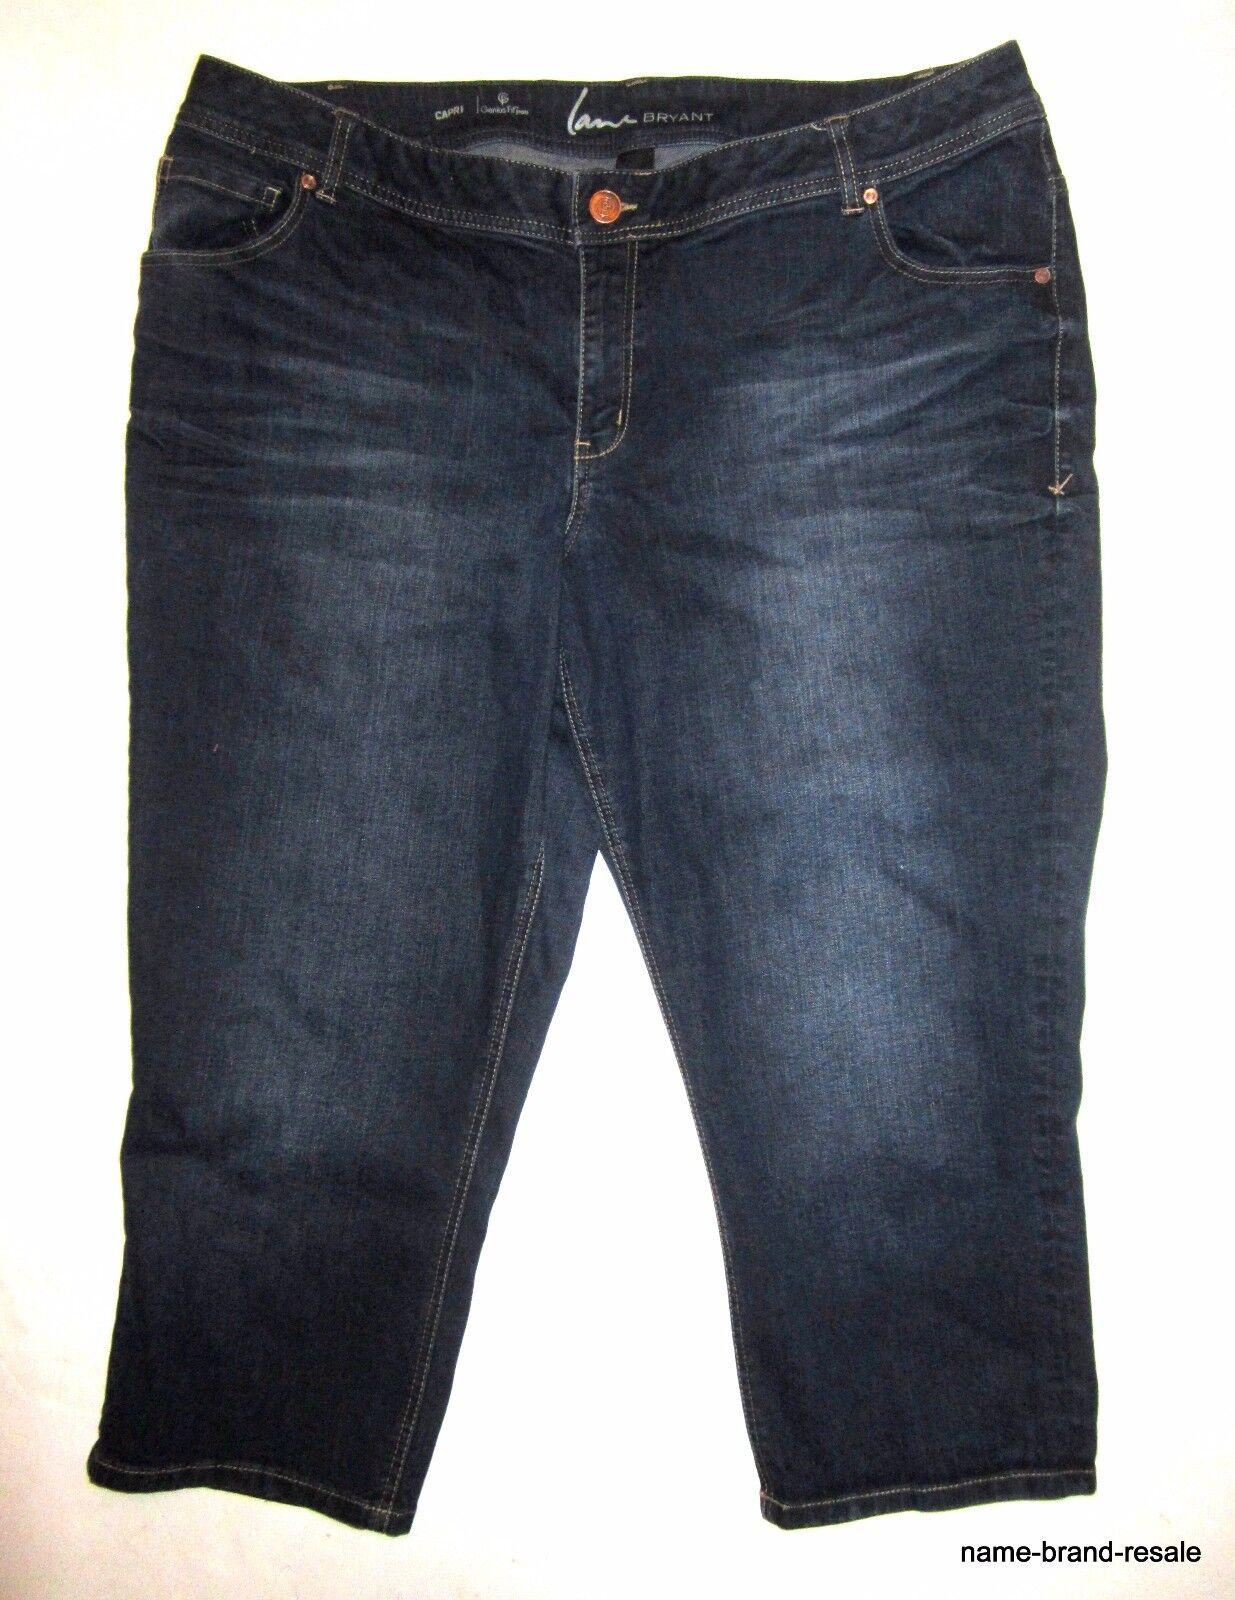 LANE BRYANT Genius Fit CAPRI Jeans WOMENS PLUS 22 3X Cropped Stretch Dark Wash